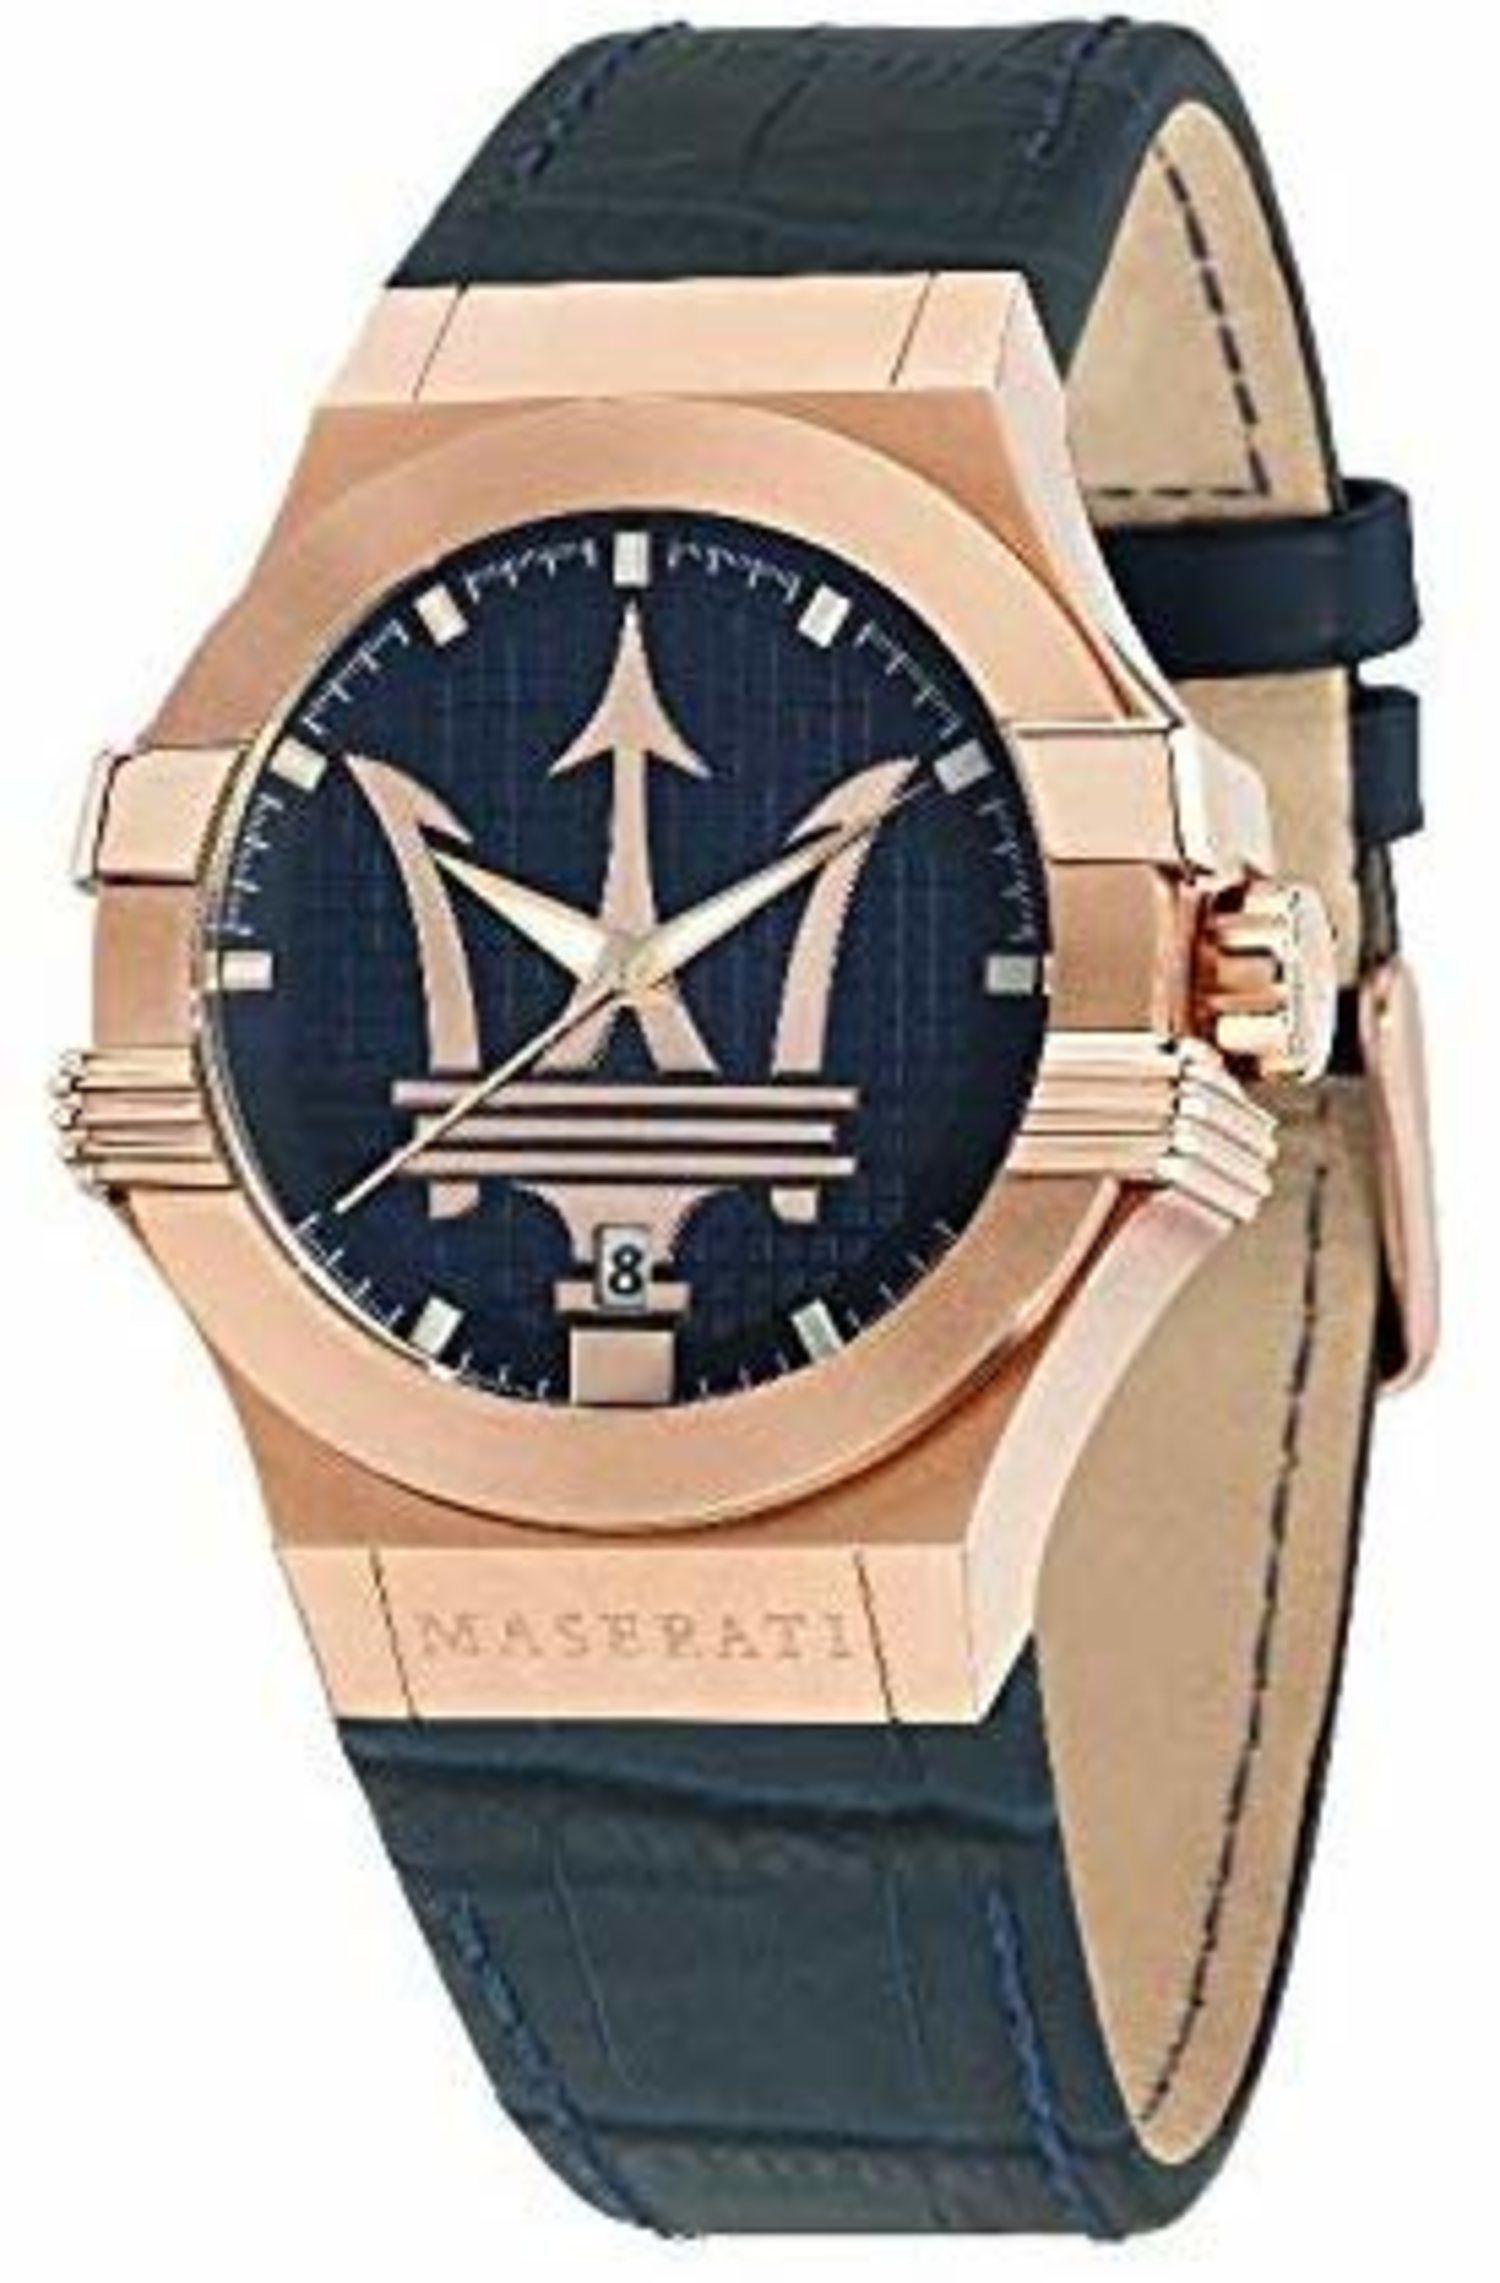 Reloj de Maserati.